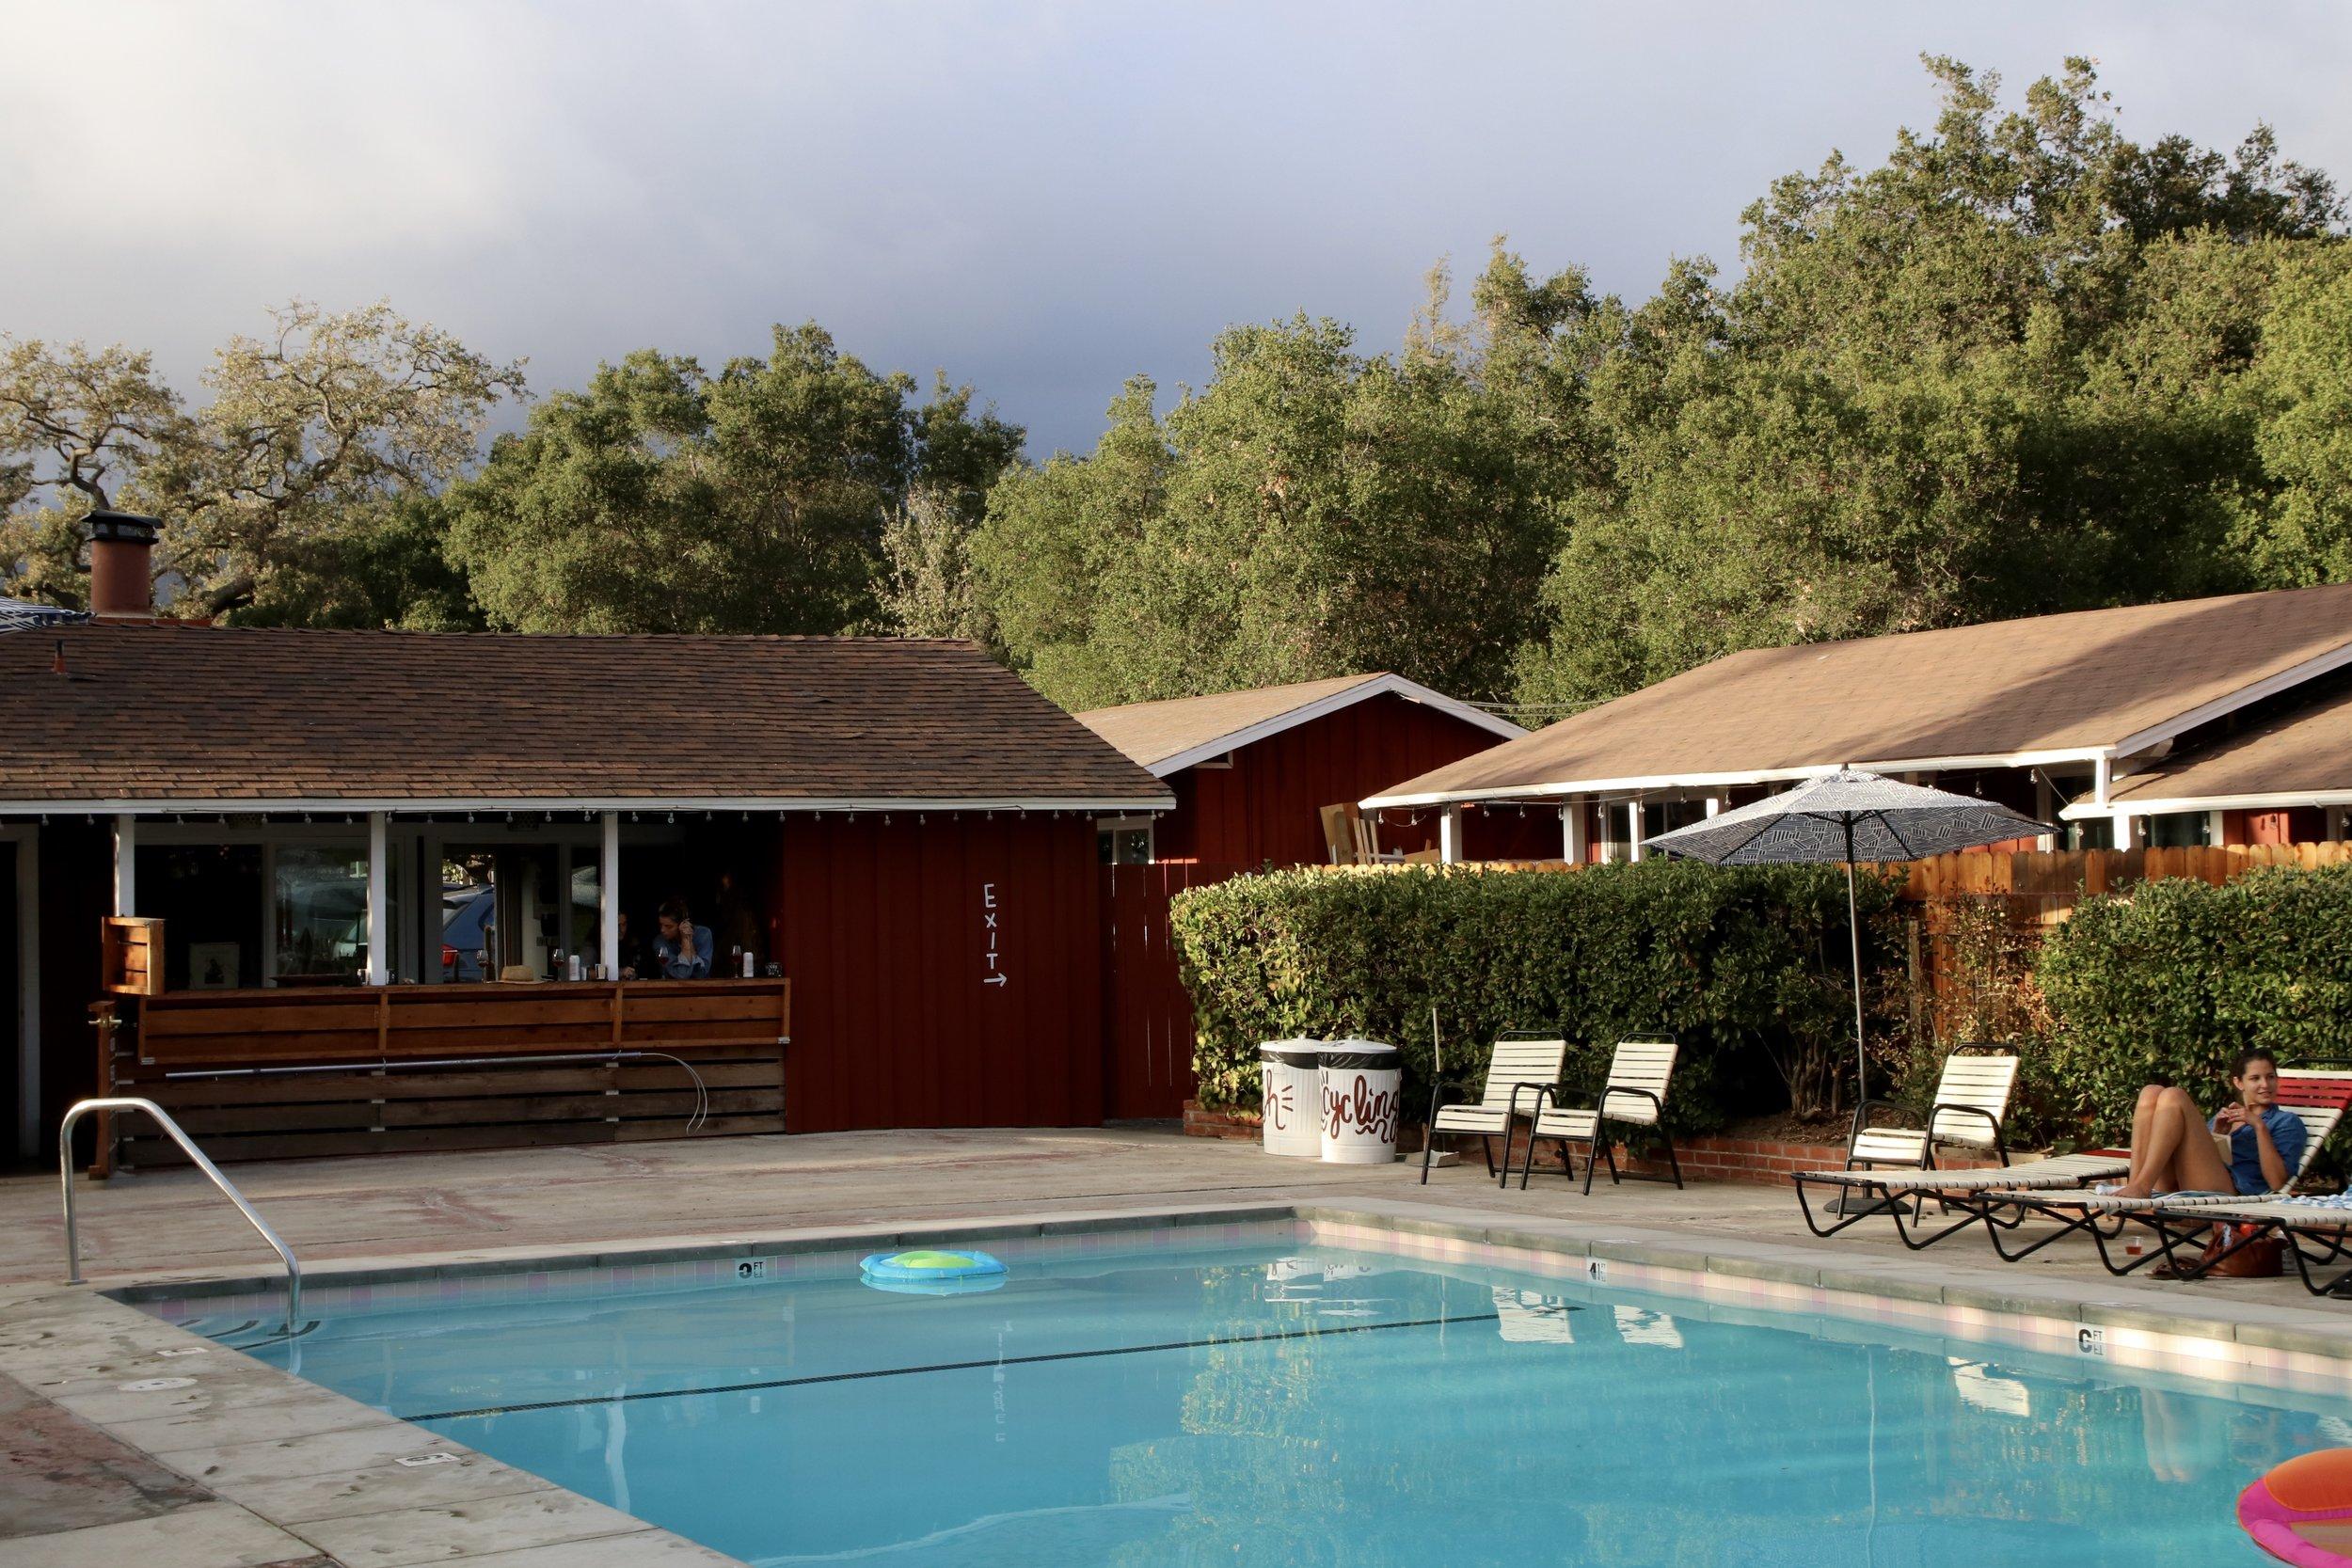 Ojai Rancho Inn's pool and bar, Chief's Peak.